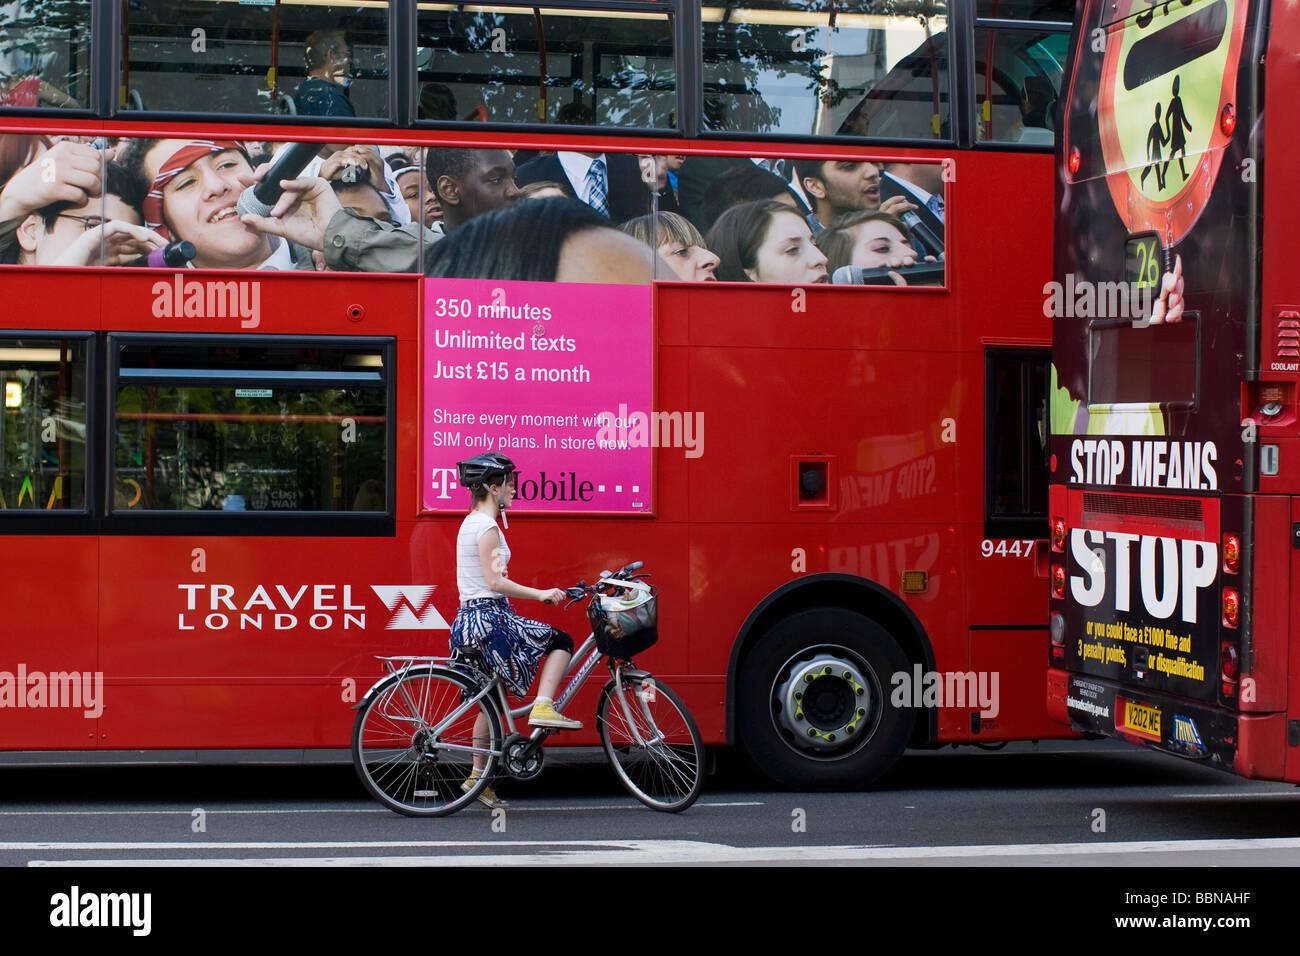 Hembra con casco de ciclista, entre autobuses de Londres Imagen De Stock